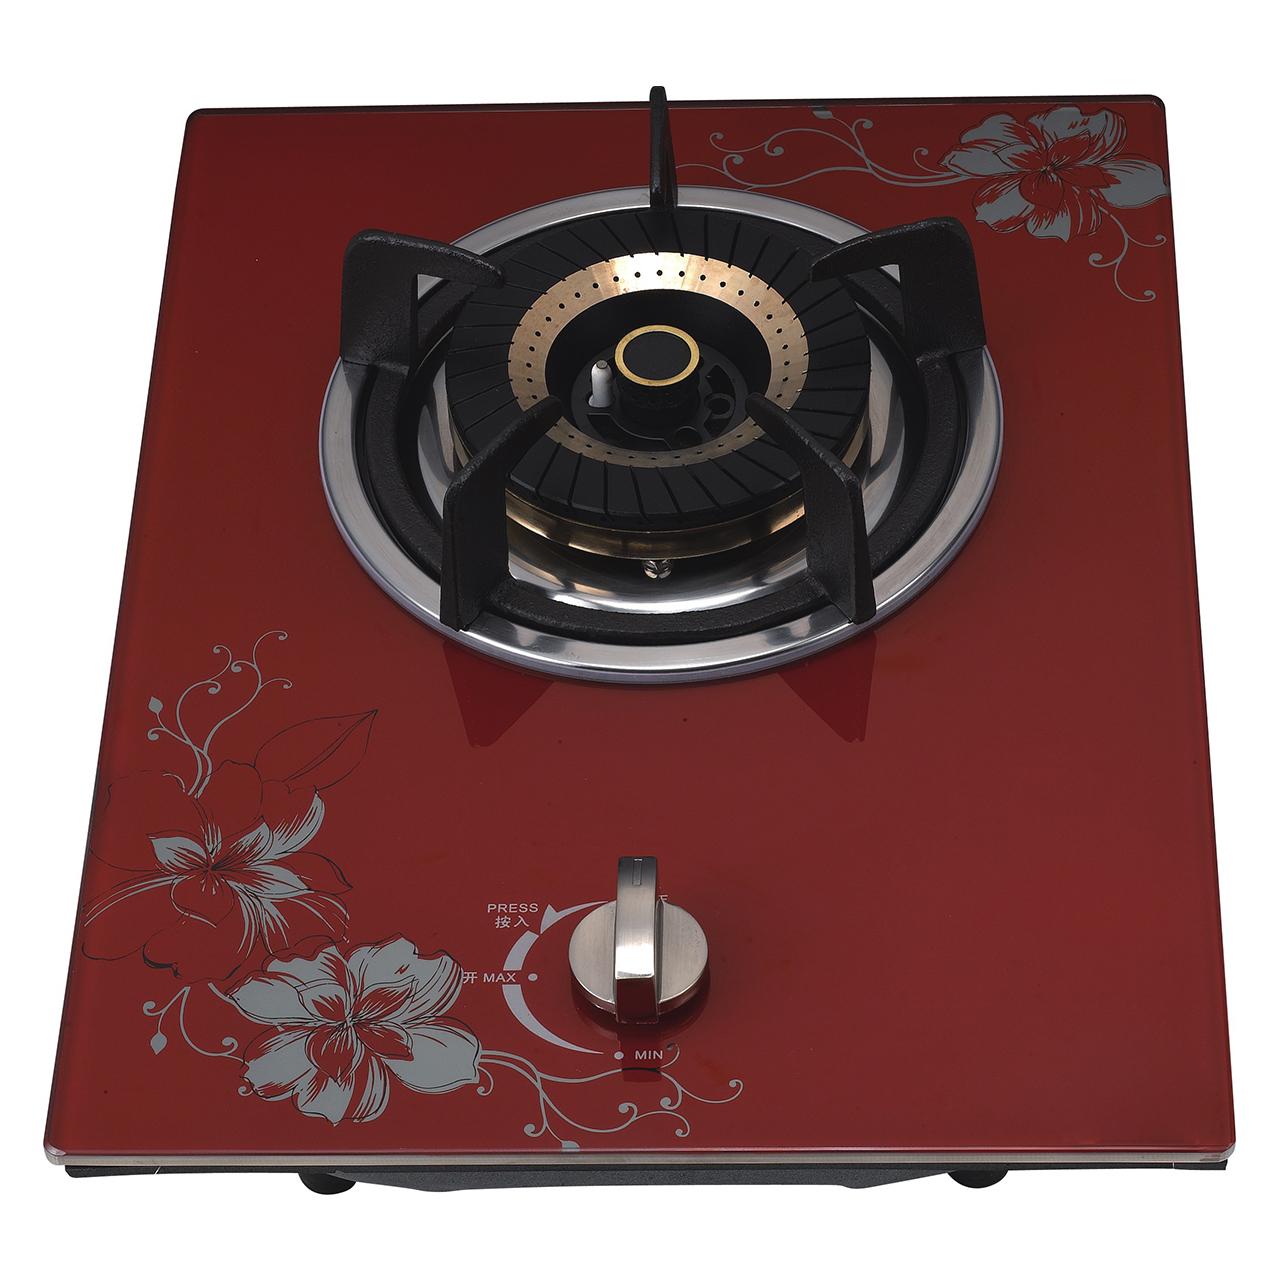 K2-Q1G008W红色玻璃单炉,燃气单灶